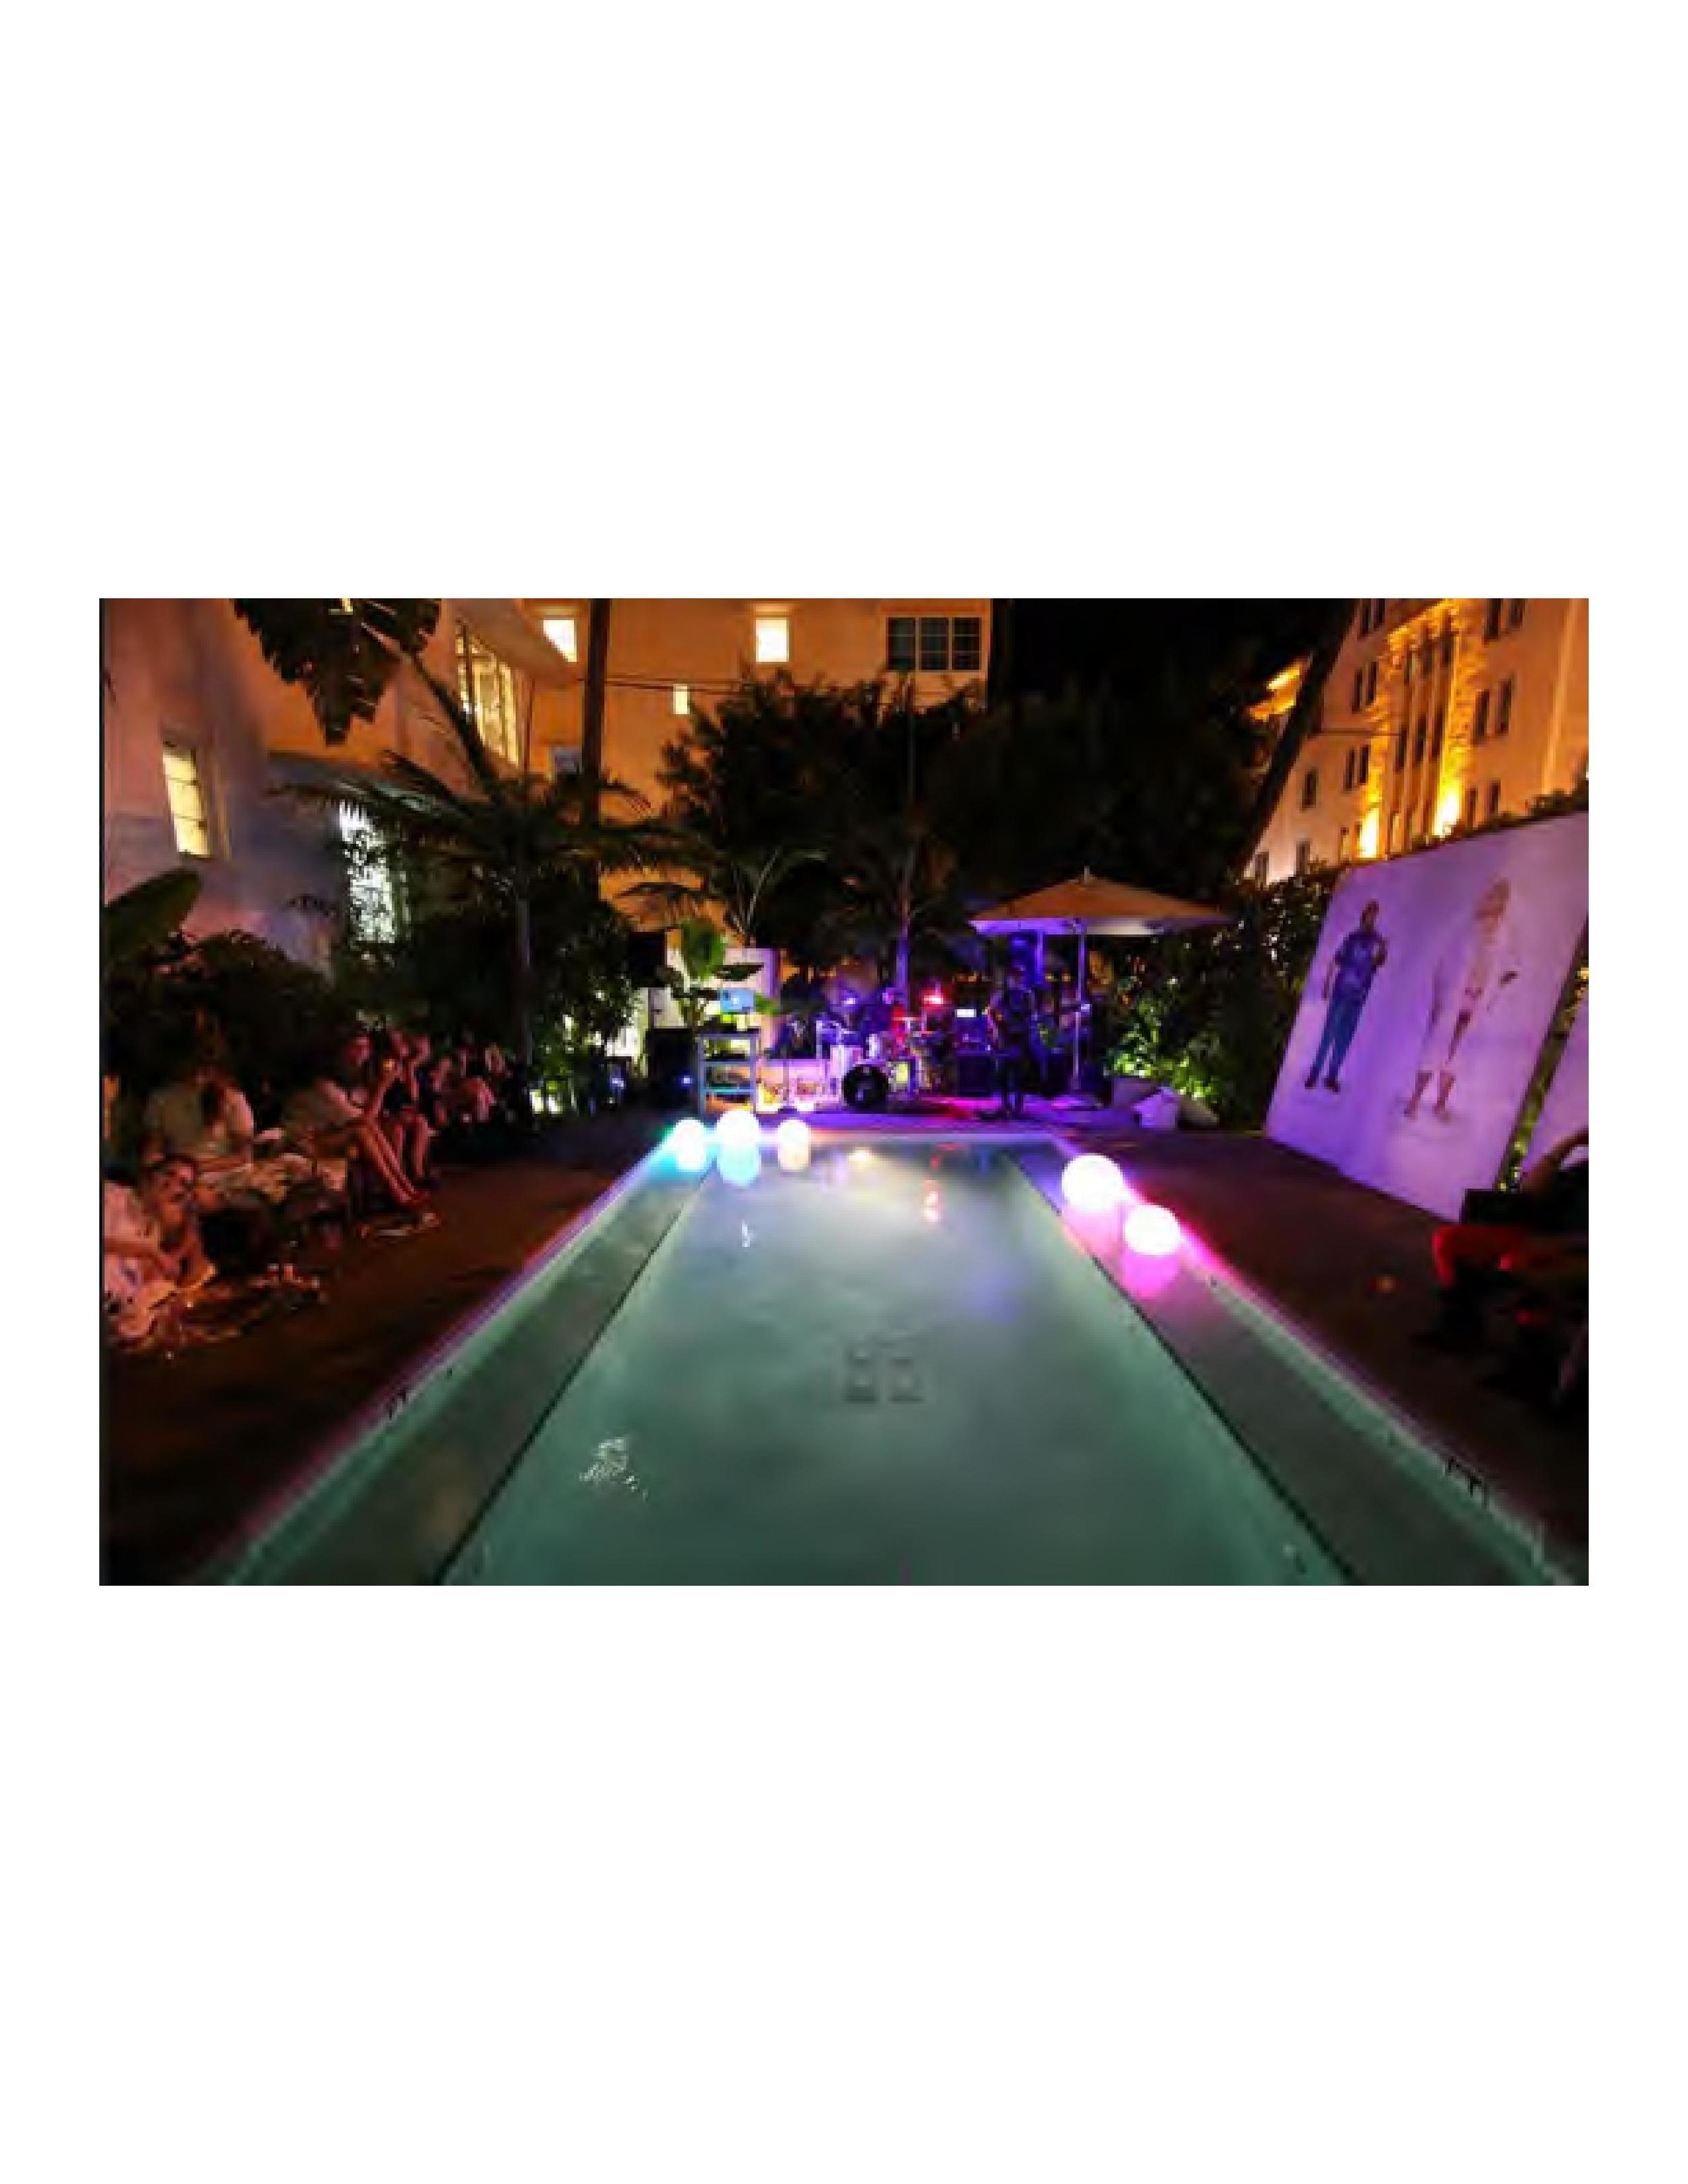 Miami_Art_Basel_Photographs-web-page-072.jpg